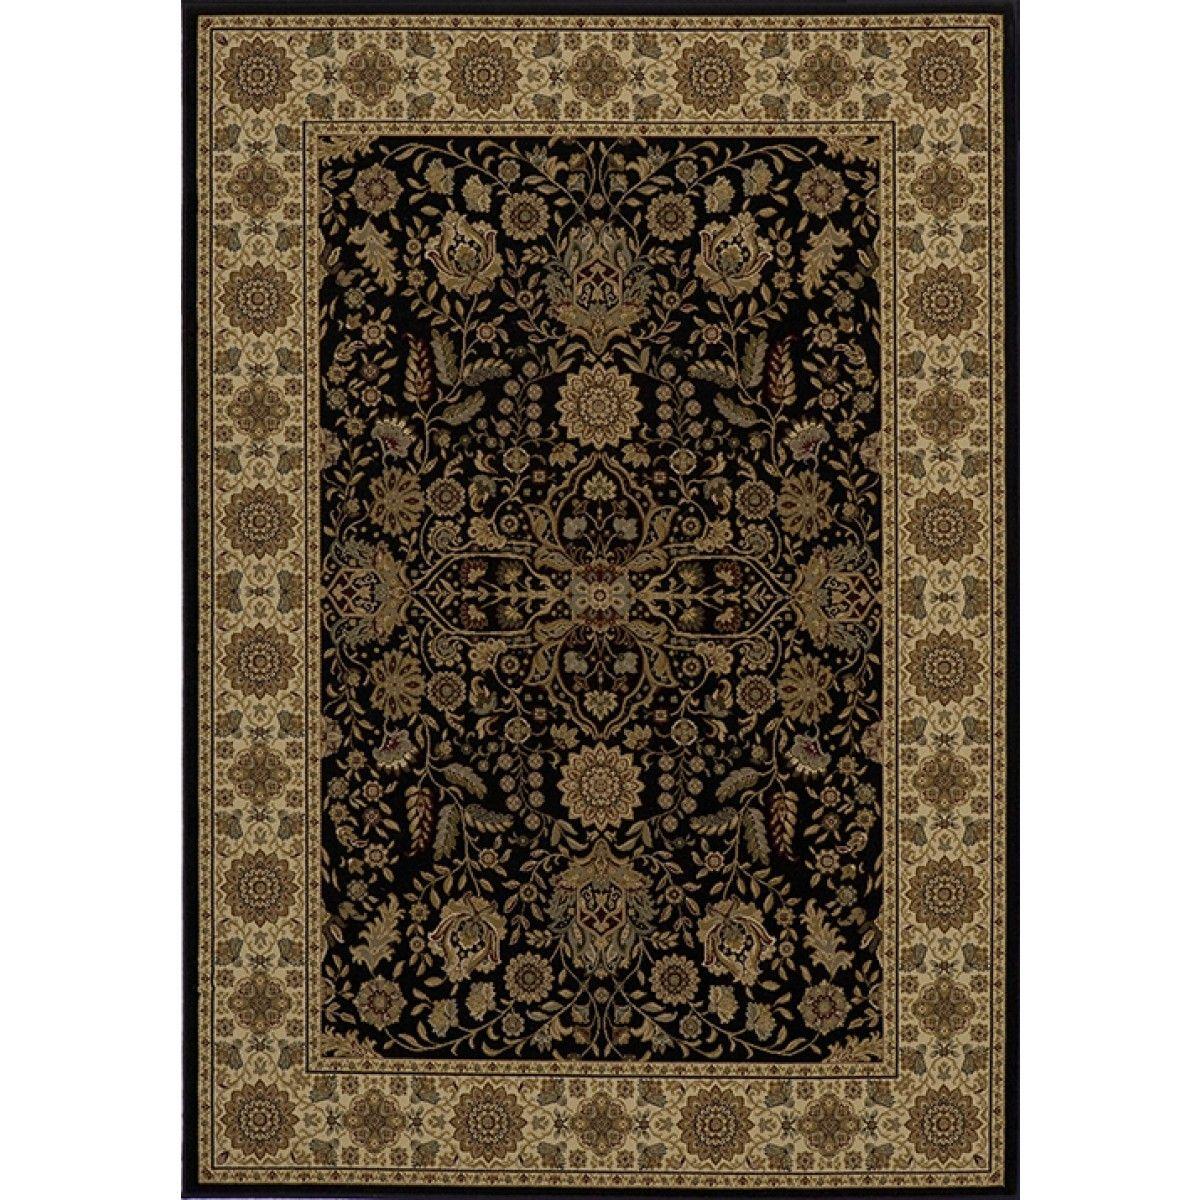 Momeni Momeni Royal Collection Rug in Black